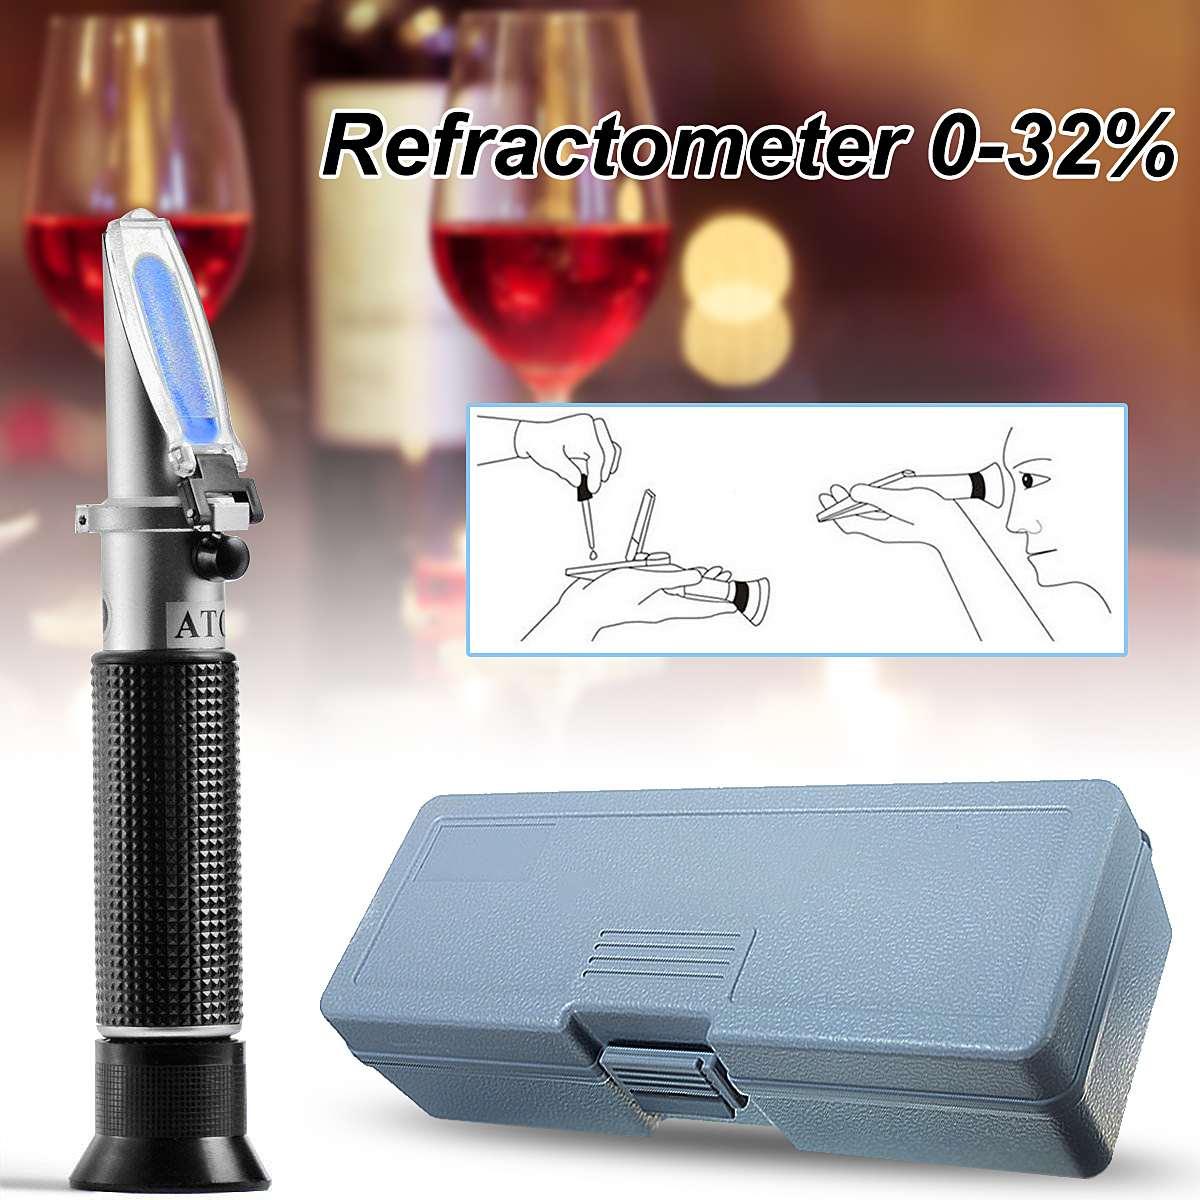 Sugar Concentration Alcohol Refraktometer 0-32% Brix Measurement Range Handheld Refractometer For Grape Wine Beer Analysis Meter